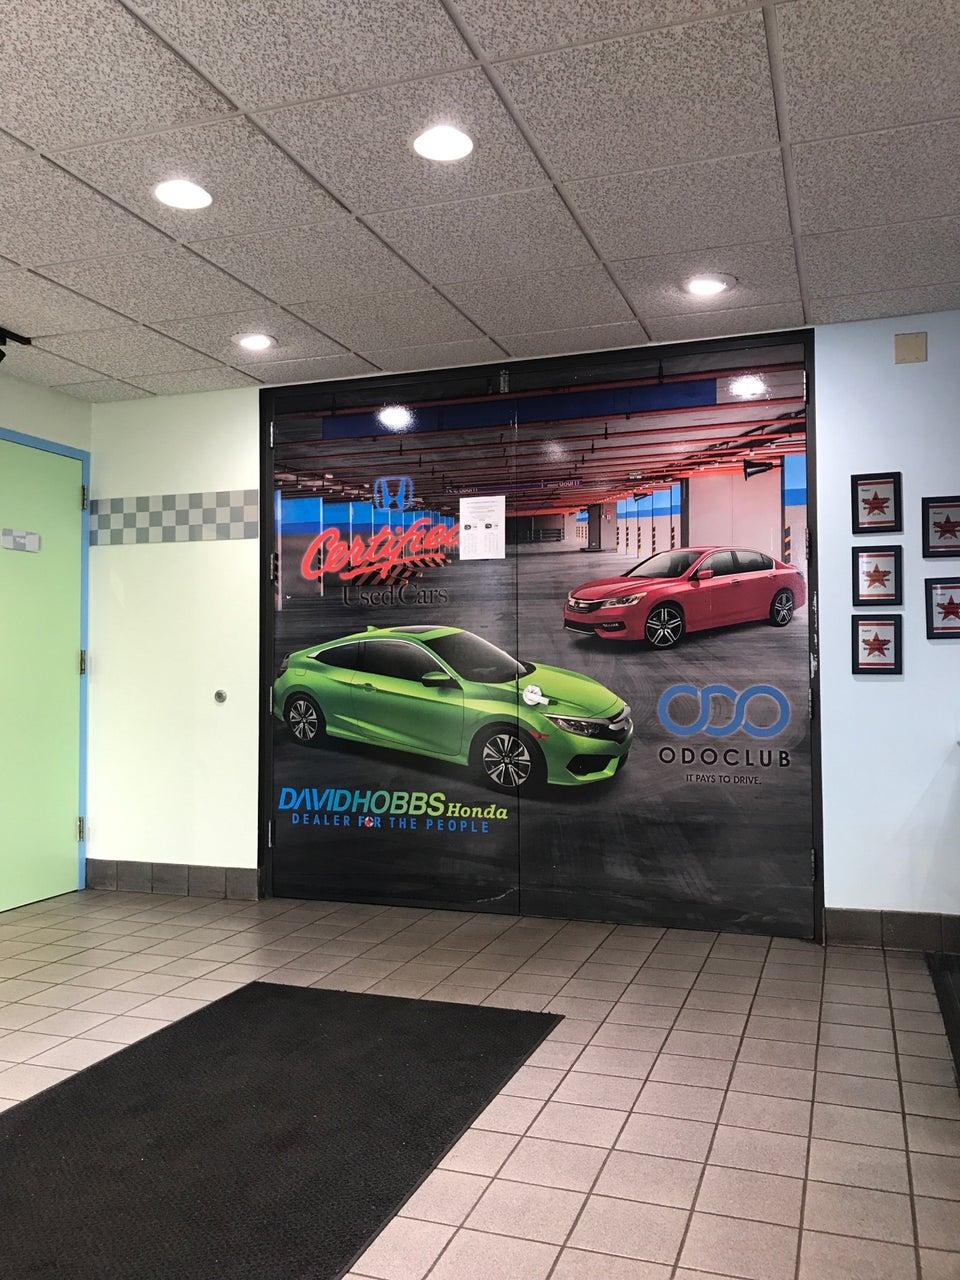 David Hobbs Honda 6100 N Green Bay Ave, Glendale